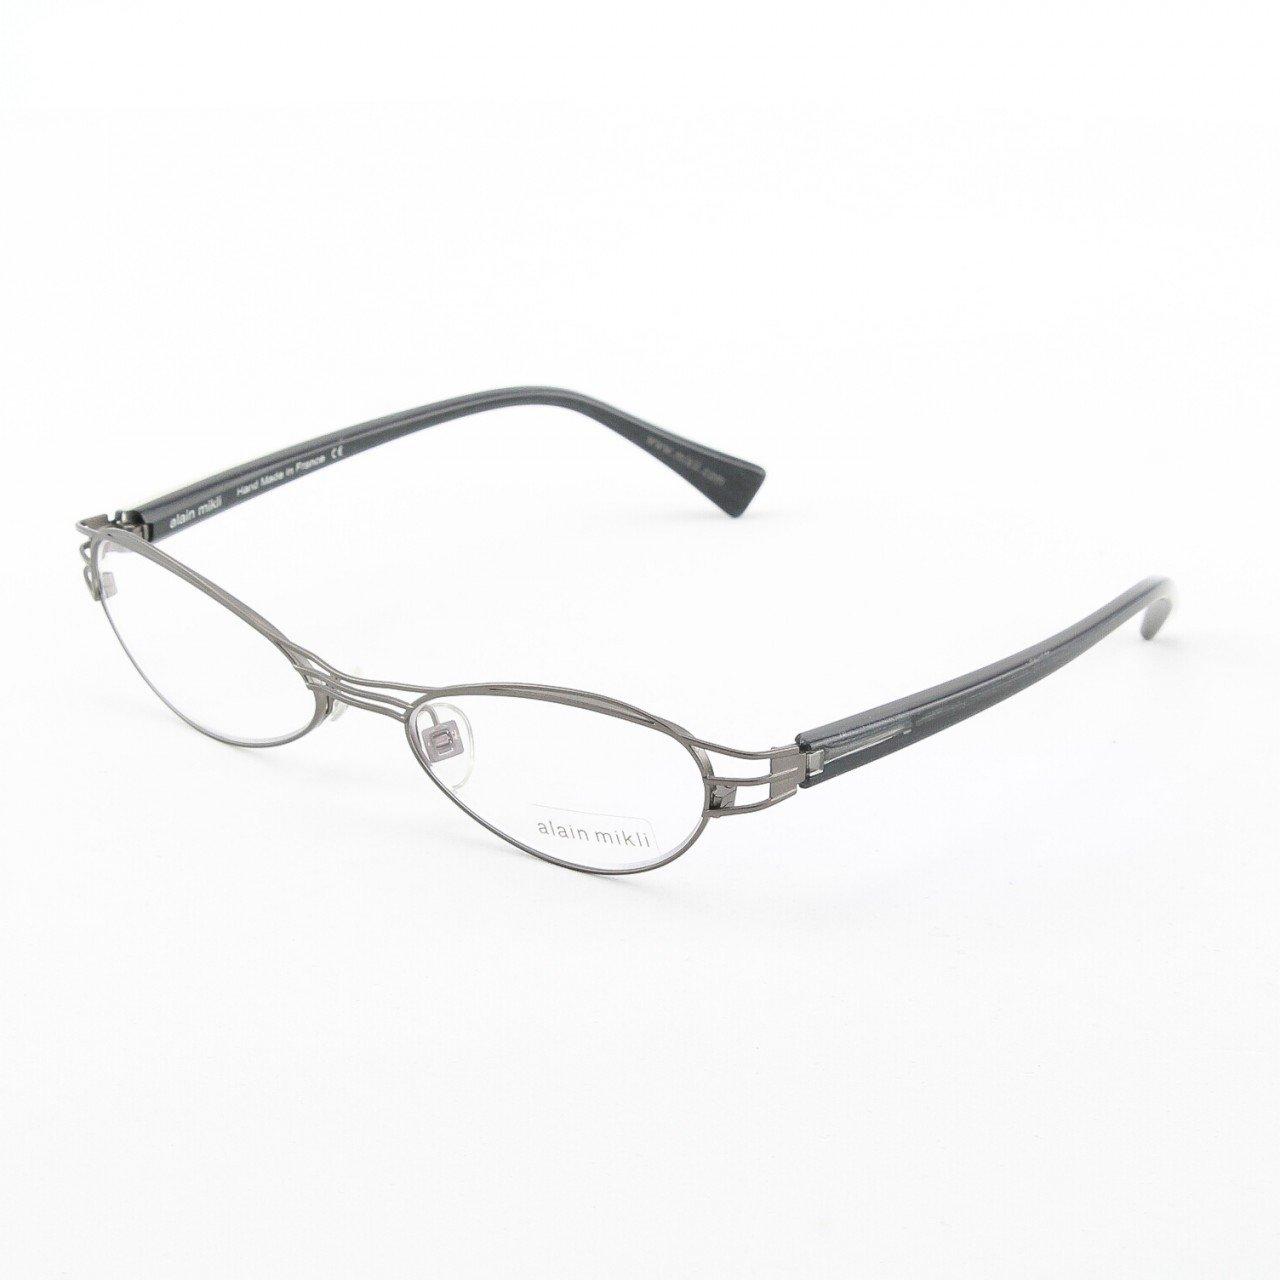 Alain Mikli Eyeglasses AL1112 Col. 6 Gunmetal Gray with Black Iridescent Temples